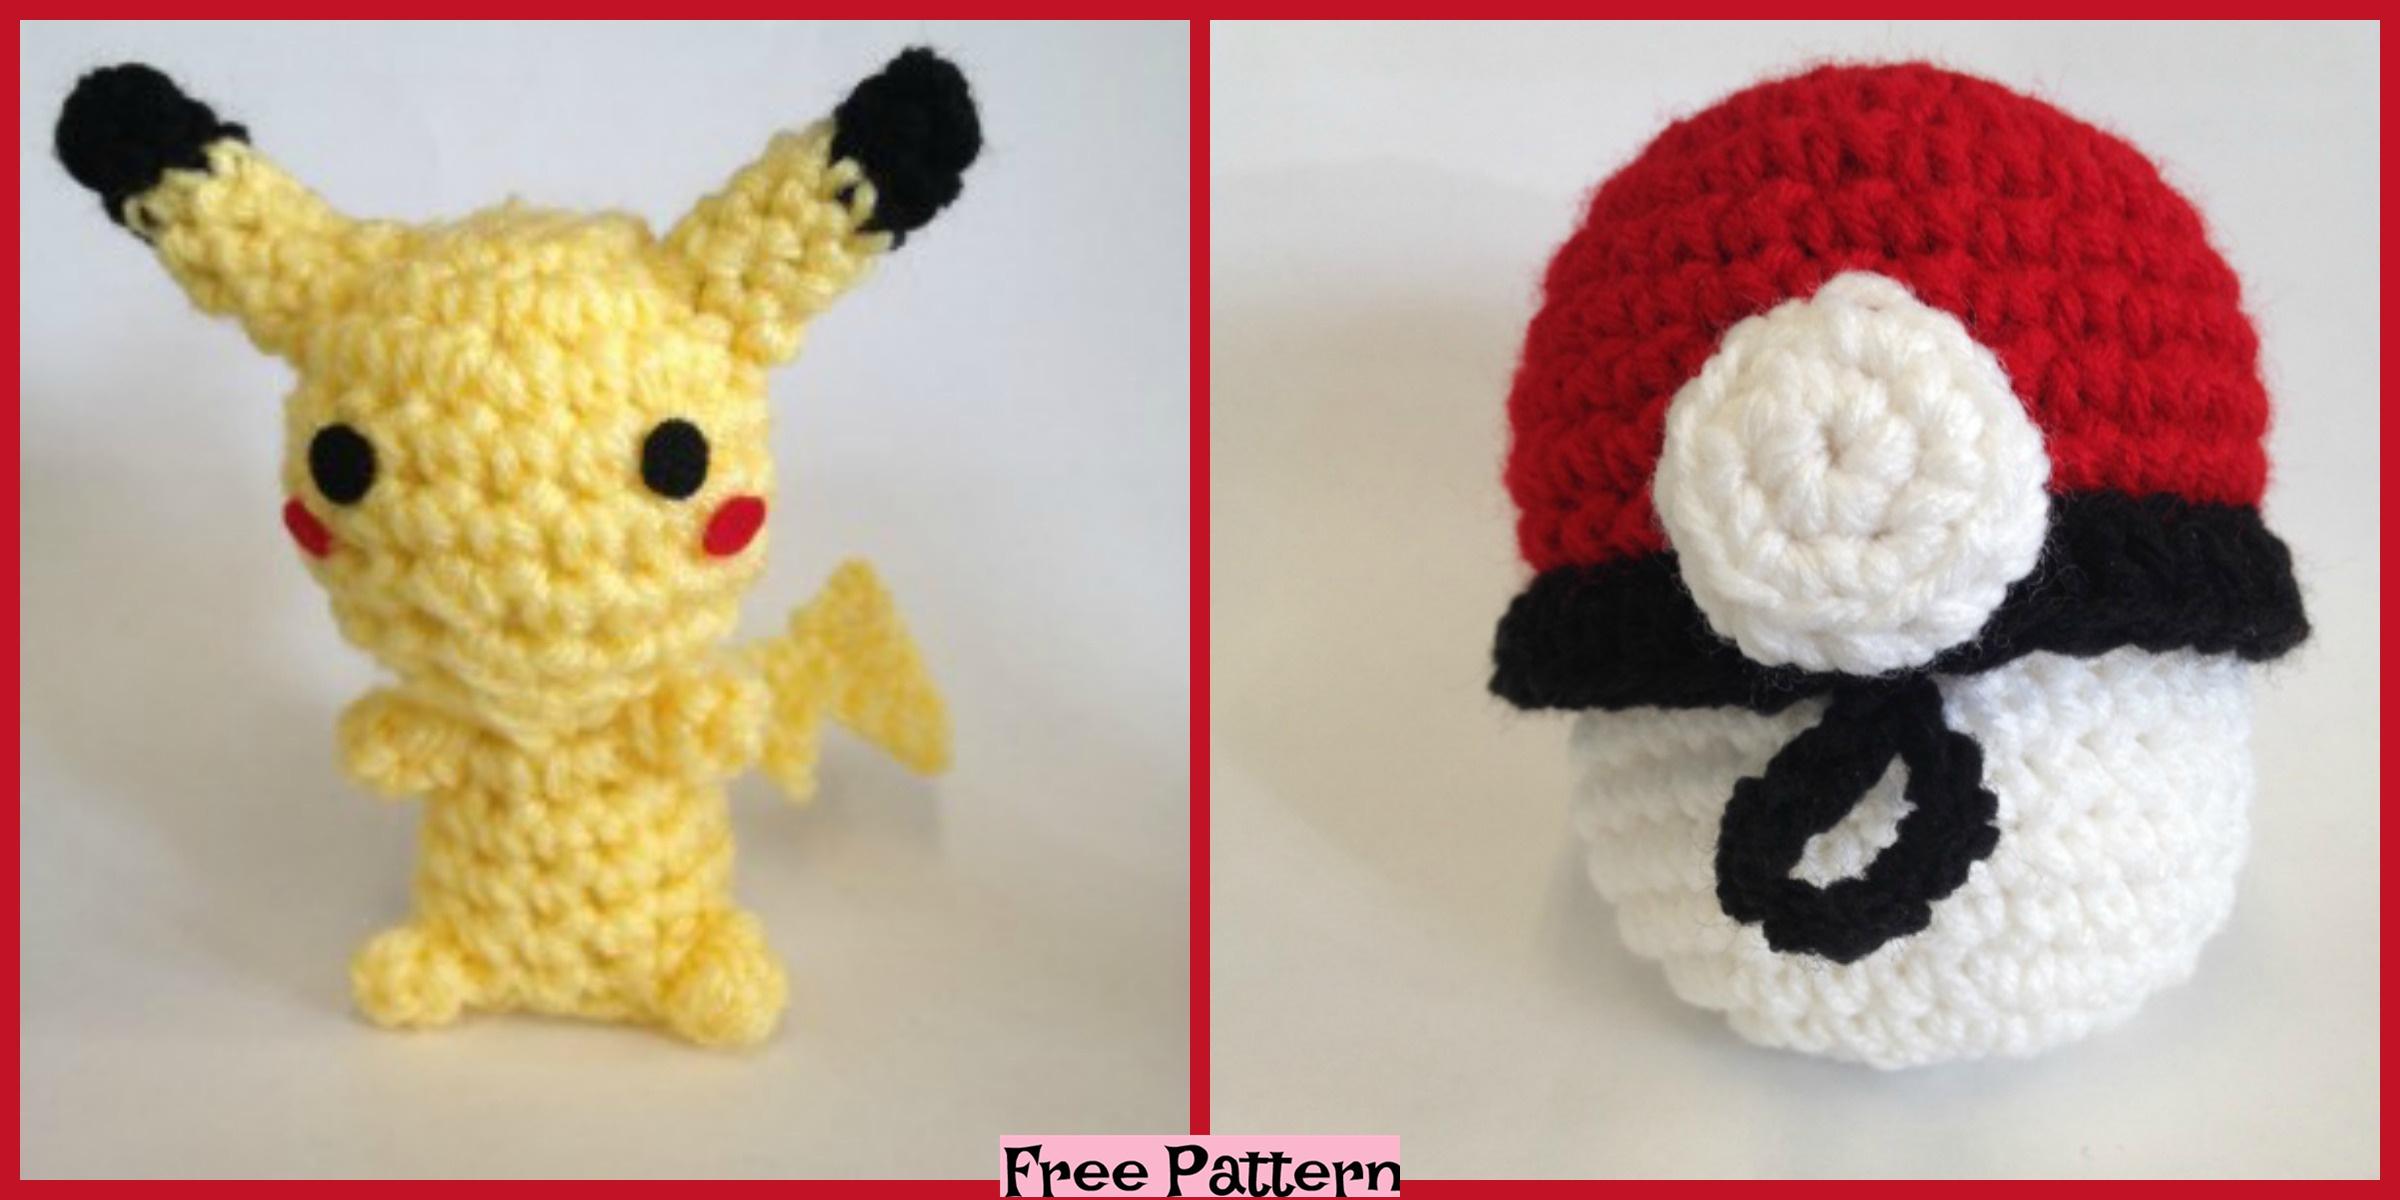 Pikachu » 53stitches » Free Amigurumi and Crochet Patterns and ... | 1200x2400